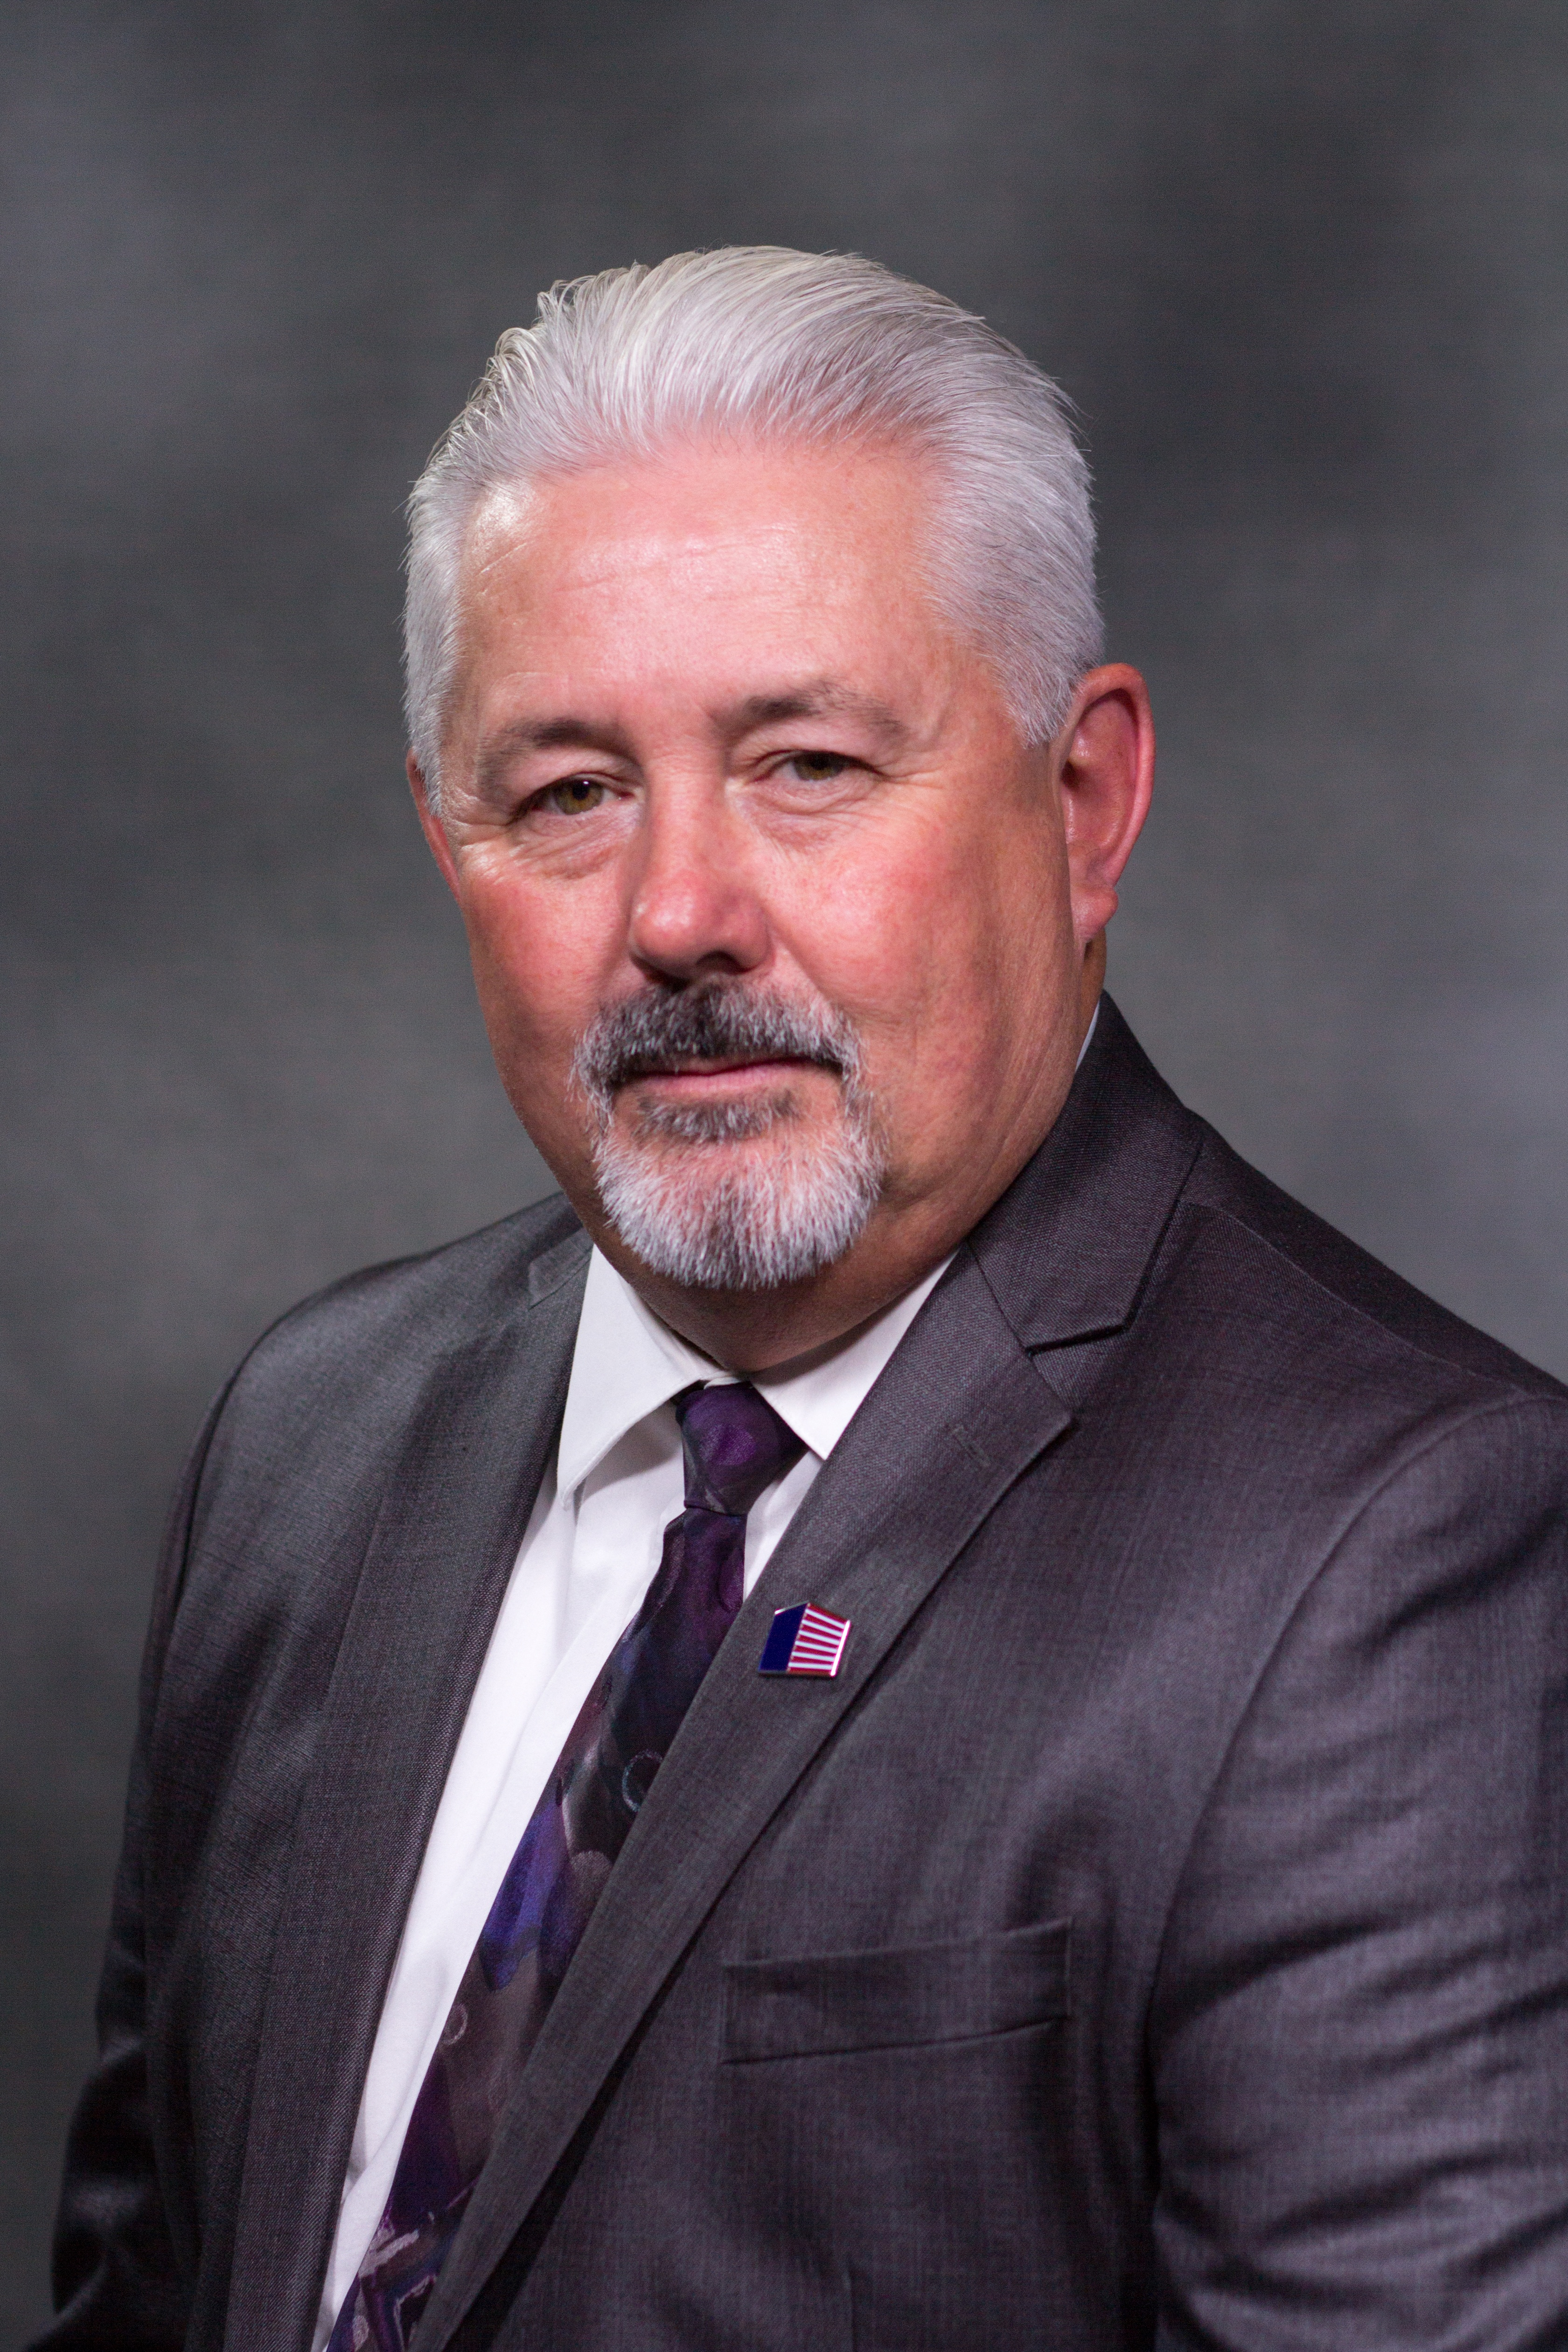 Dennis Morris, Facility Director